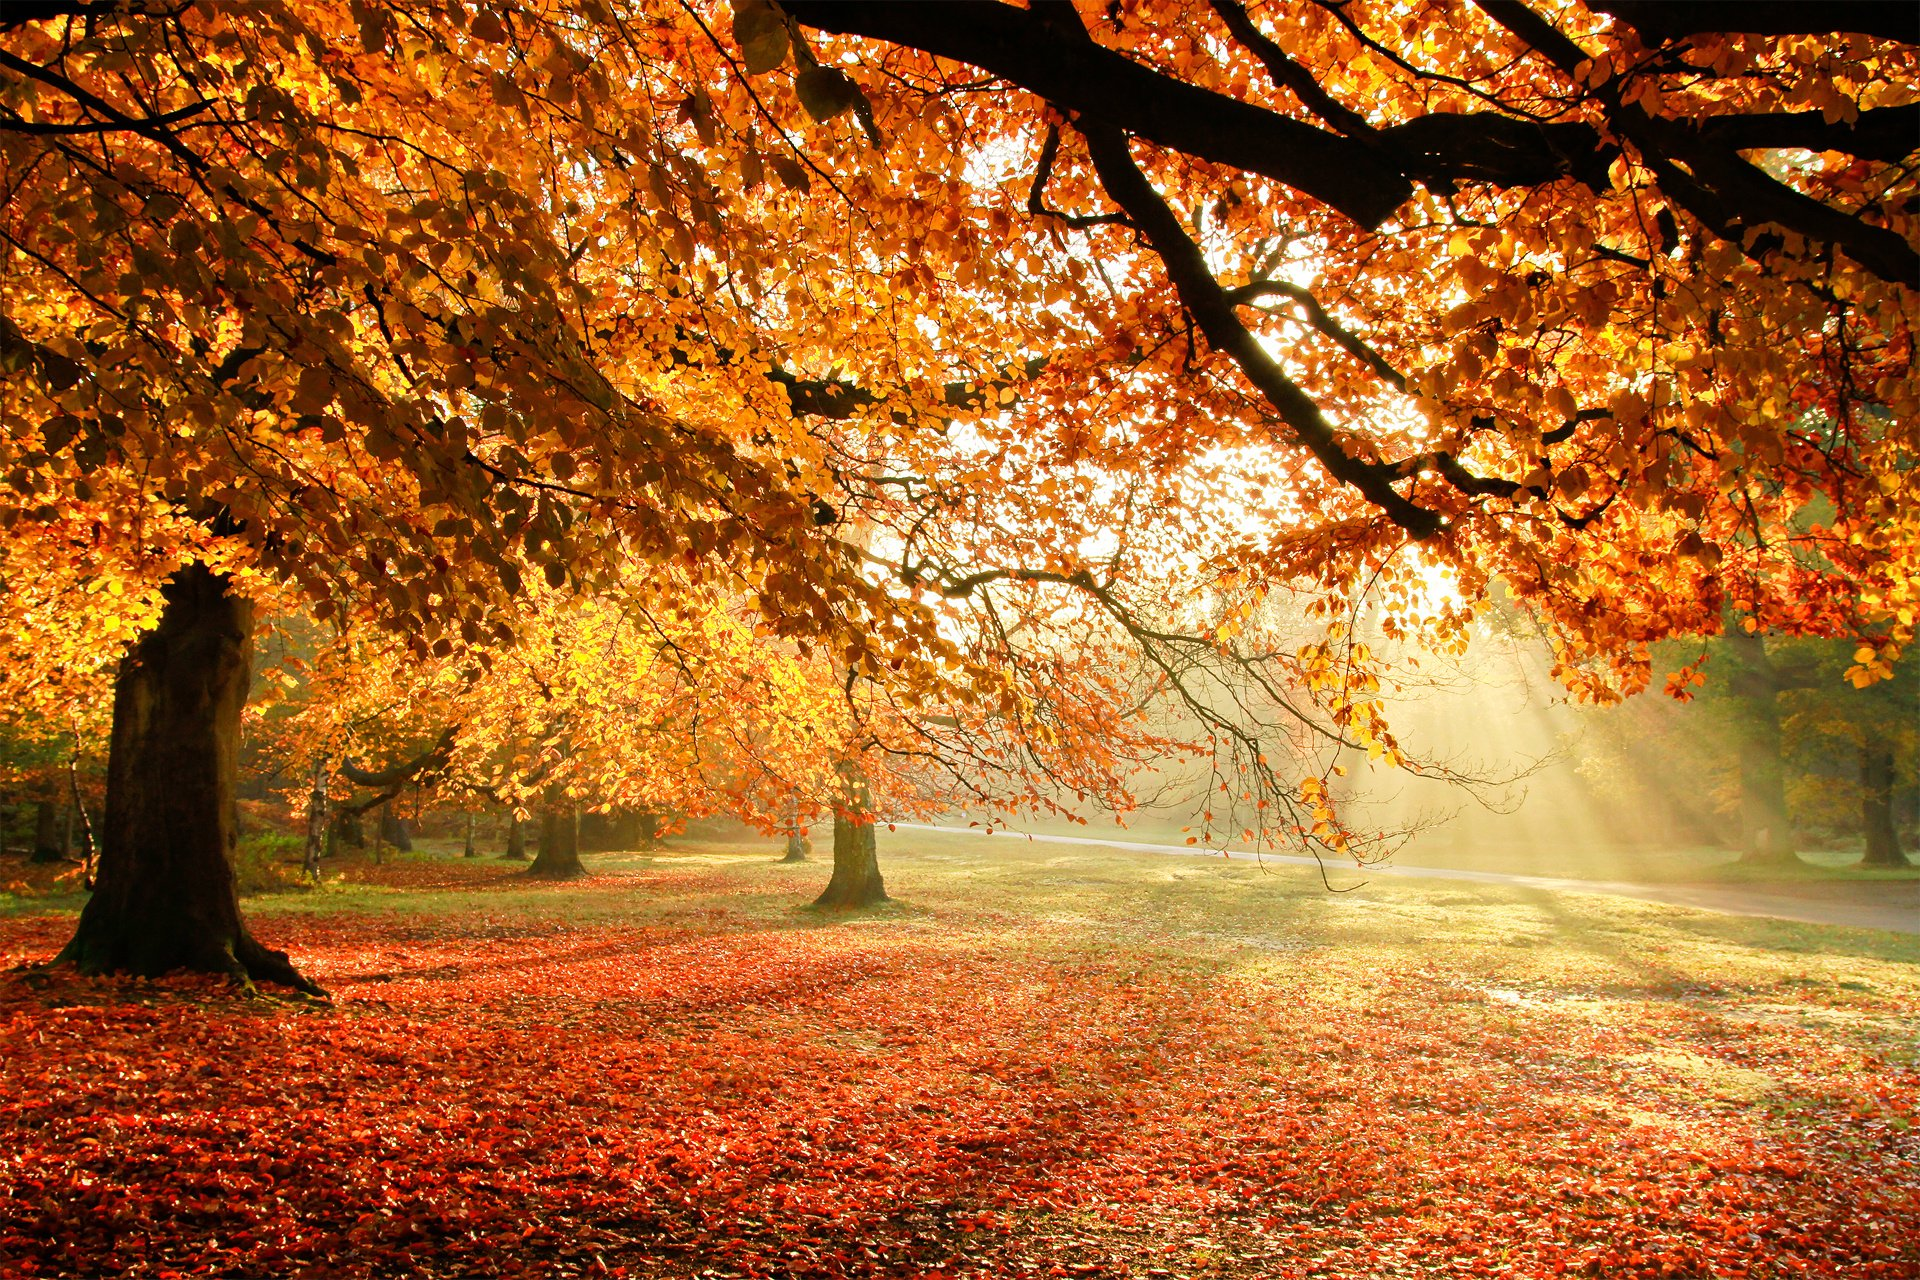 autumn trees nature light foliage wallpaper | 1920x1280 | 281528